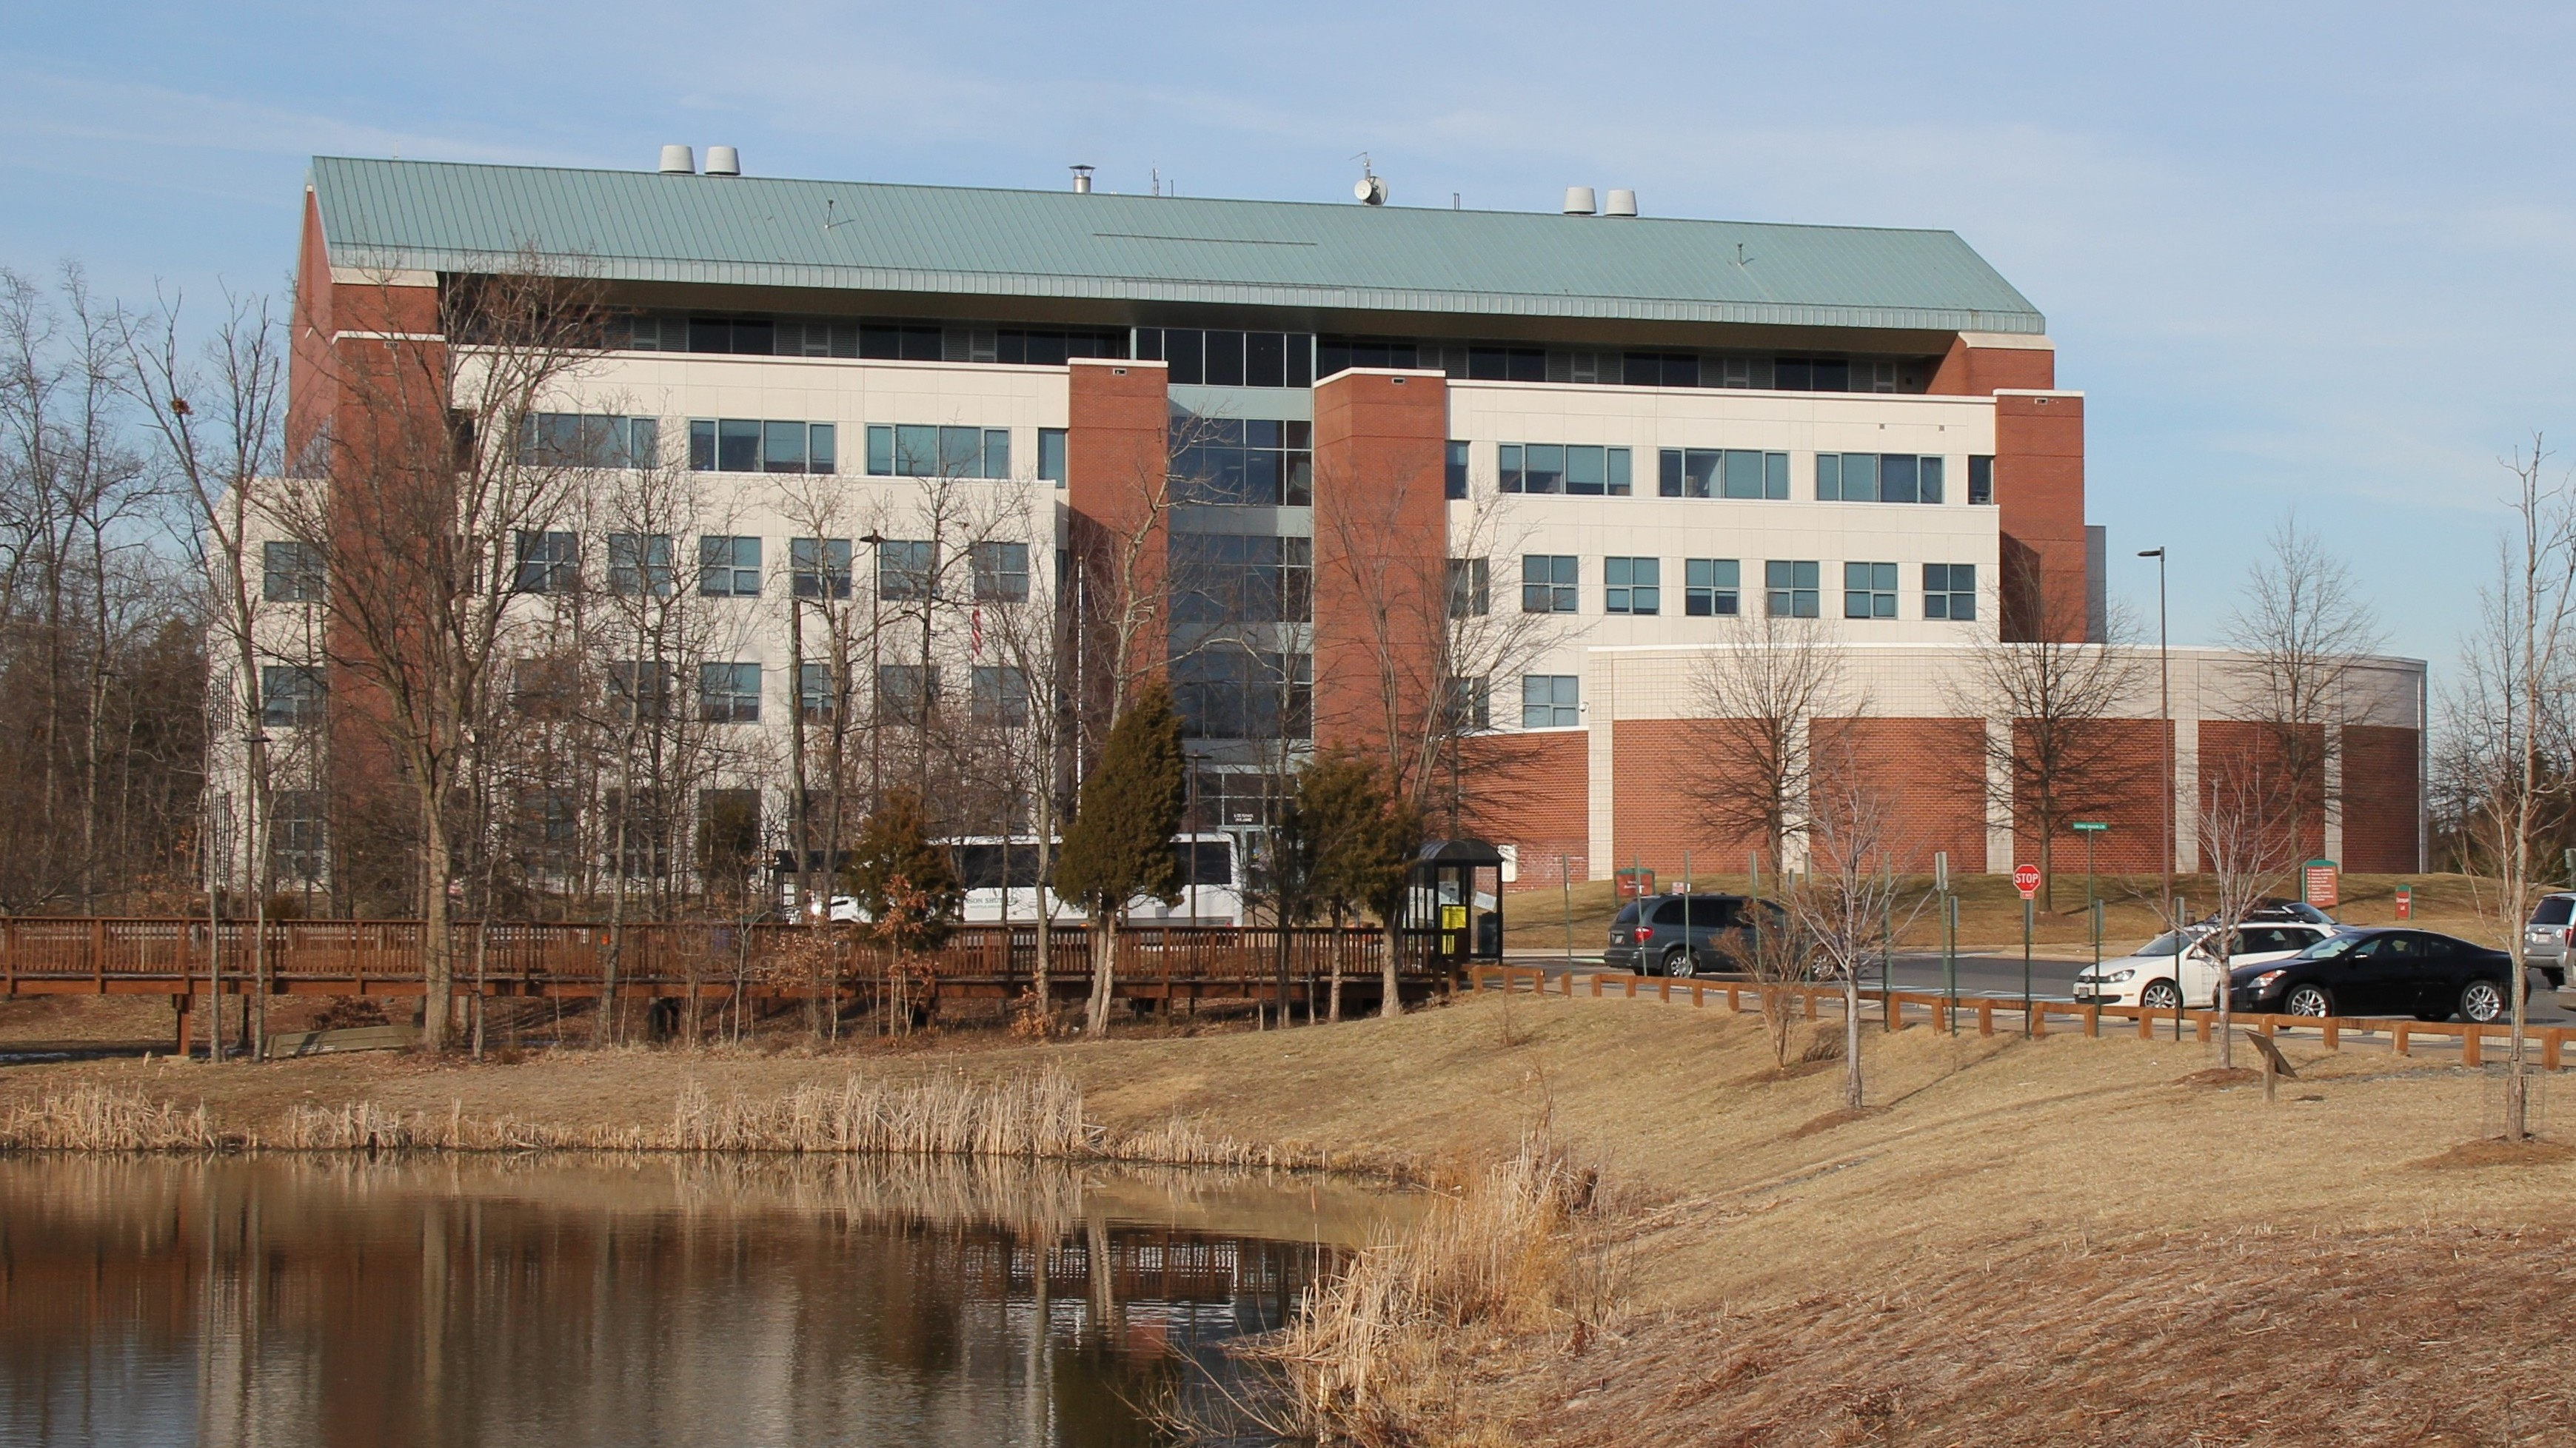 Occoquan Building at GMU